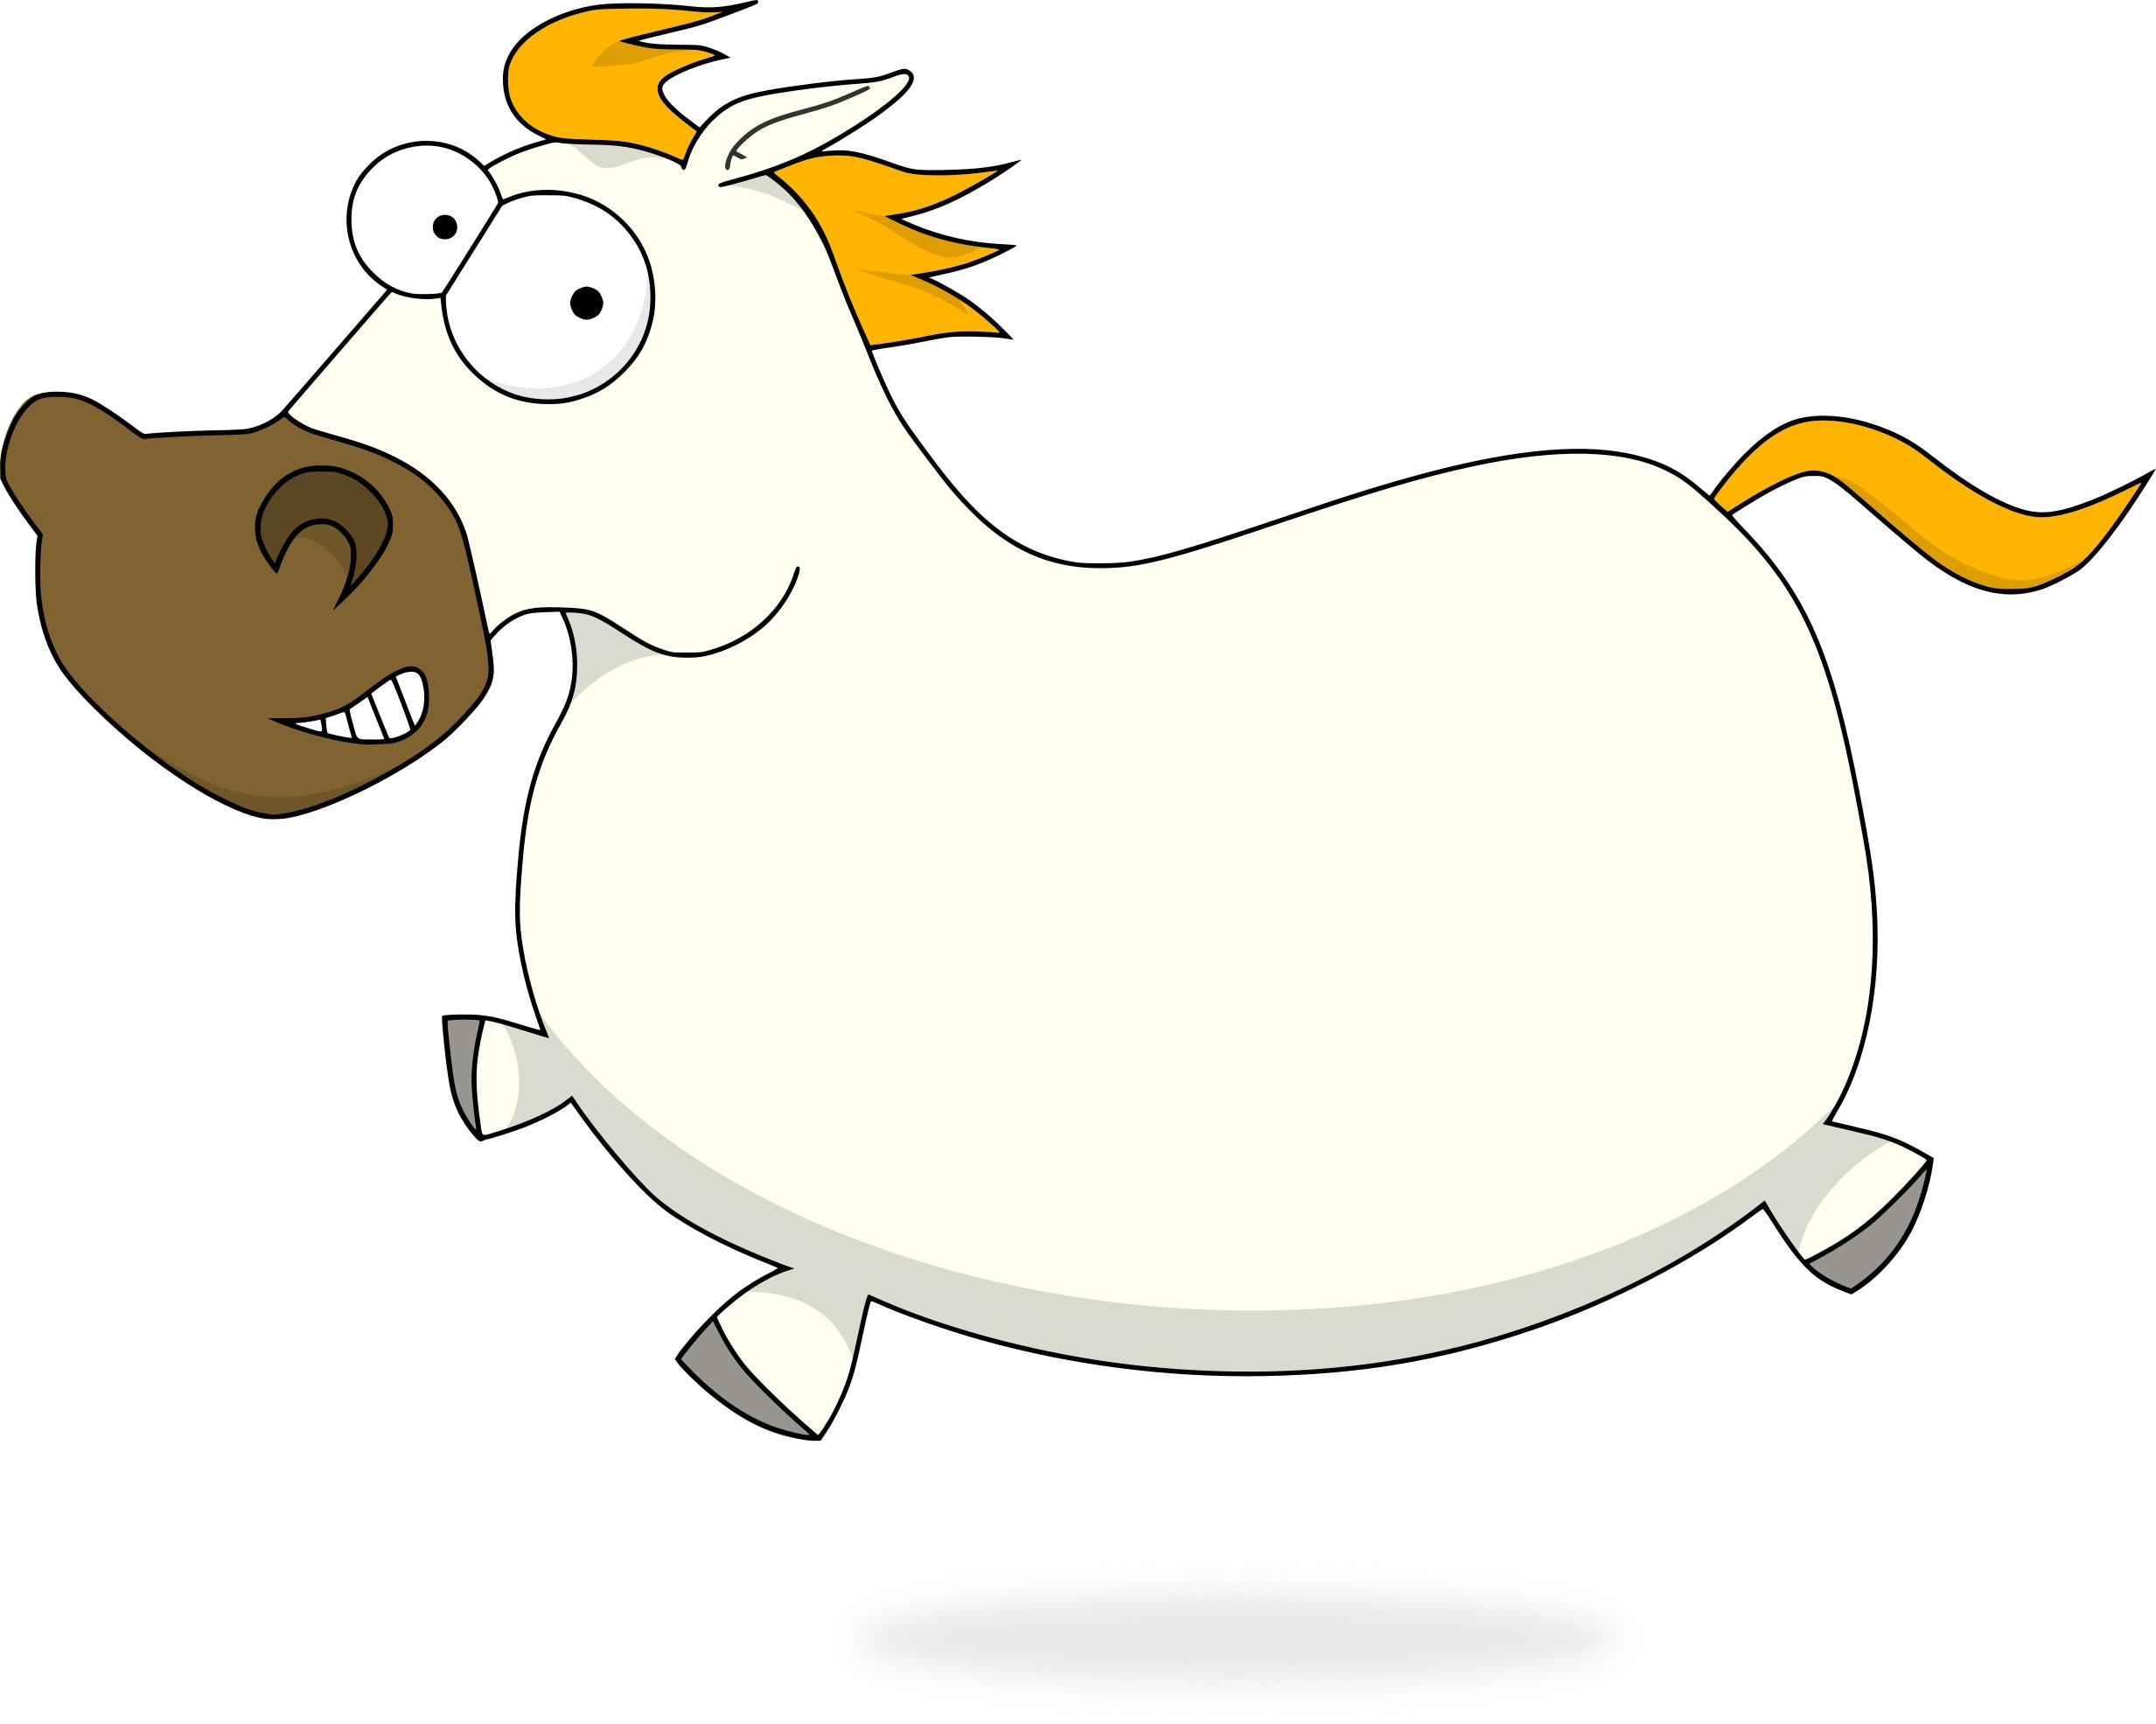 Main, the Pony mascot, galloping